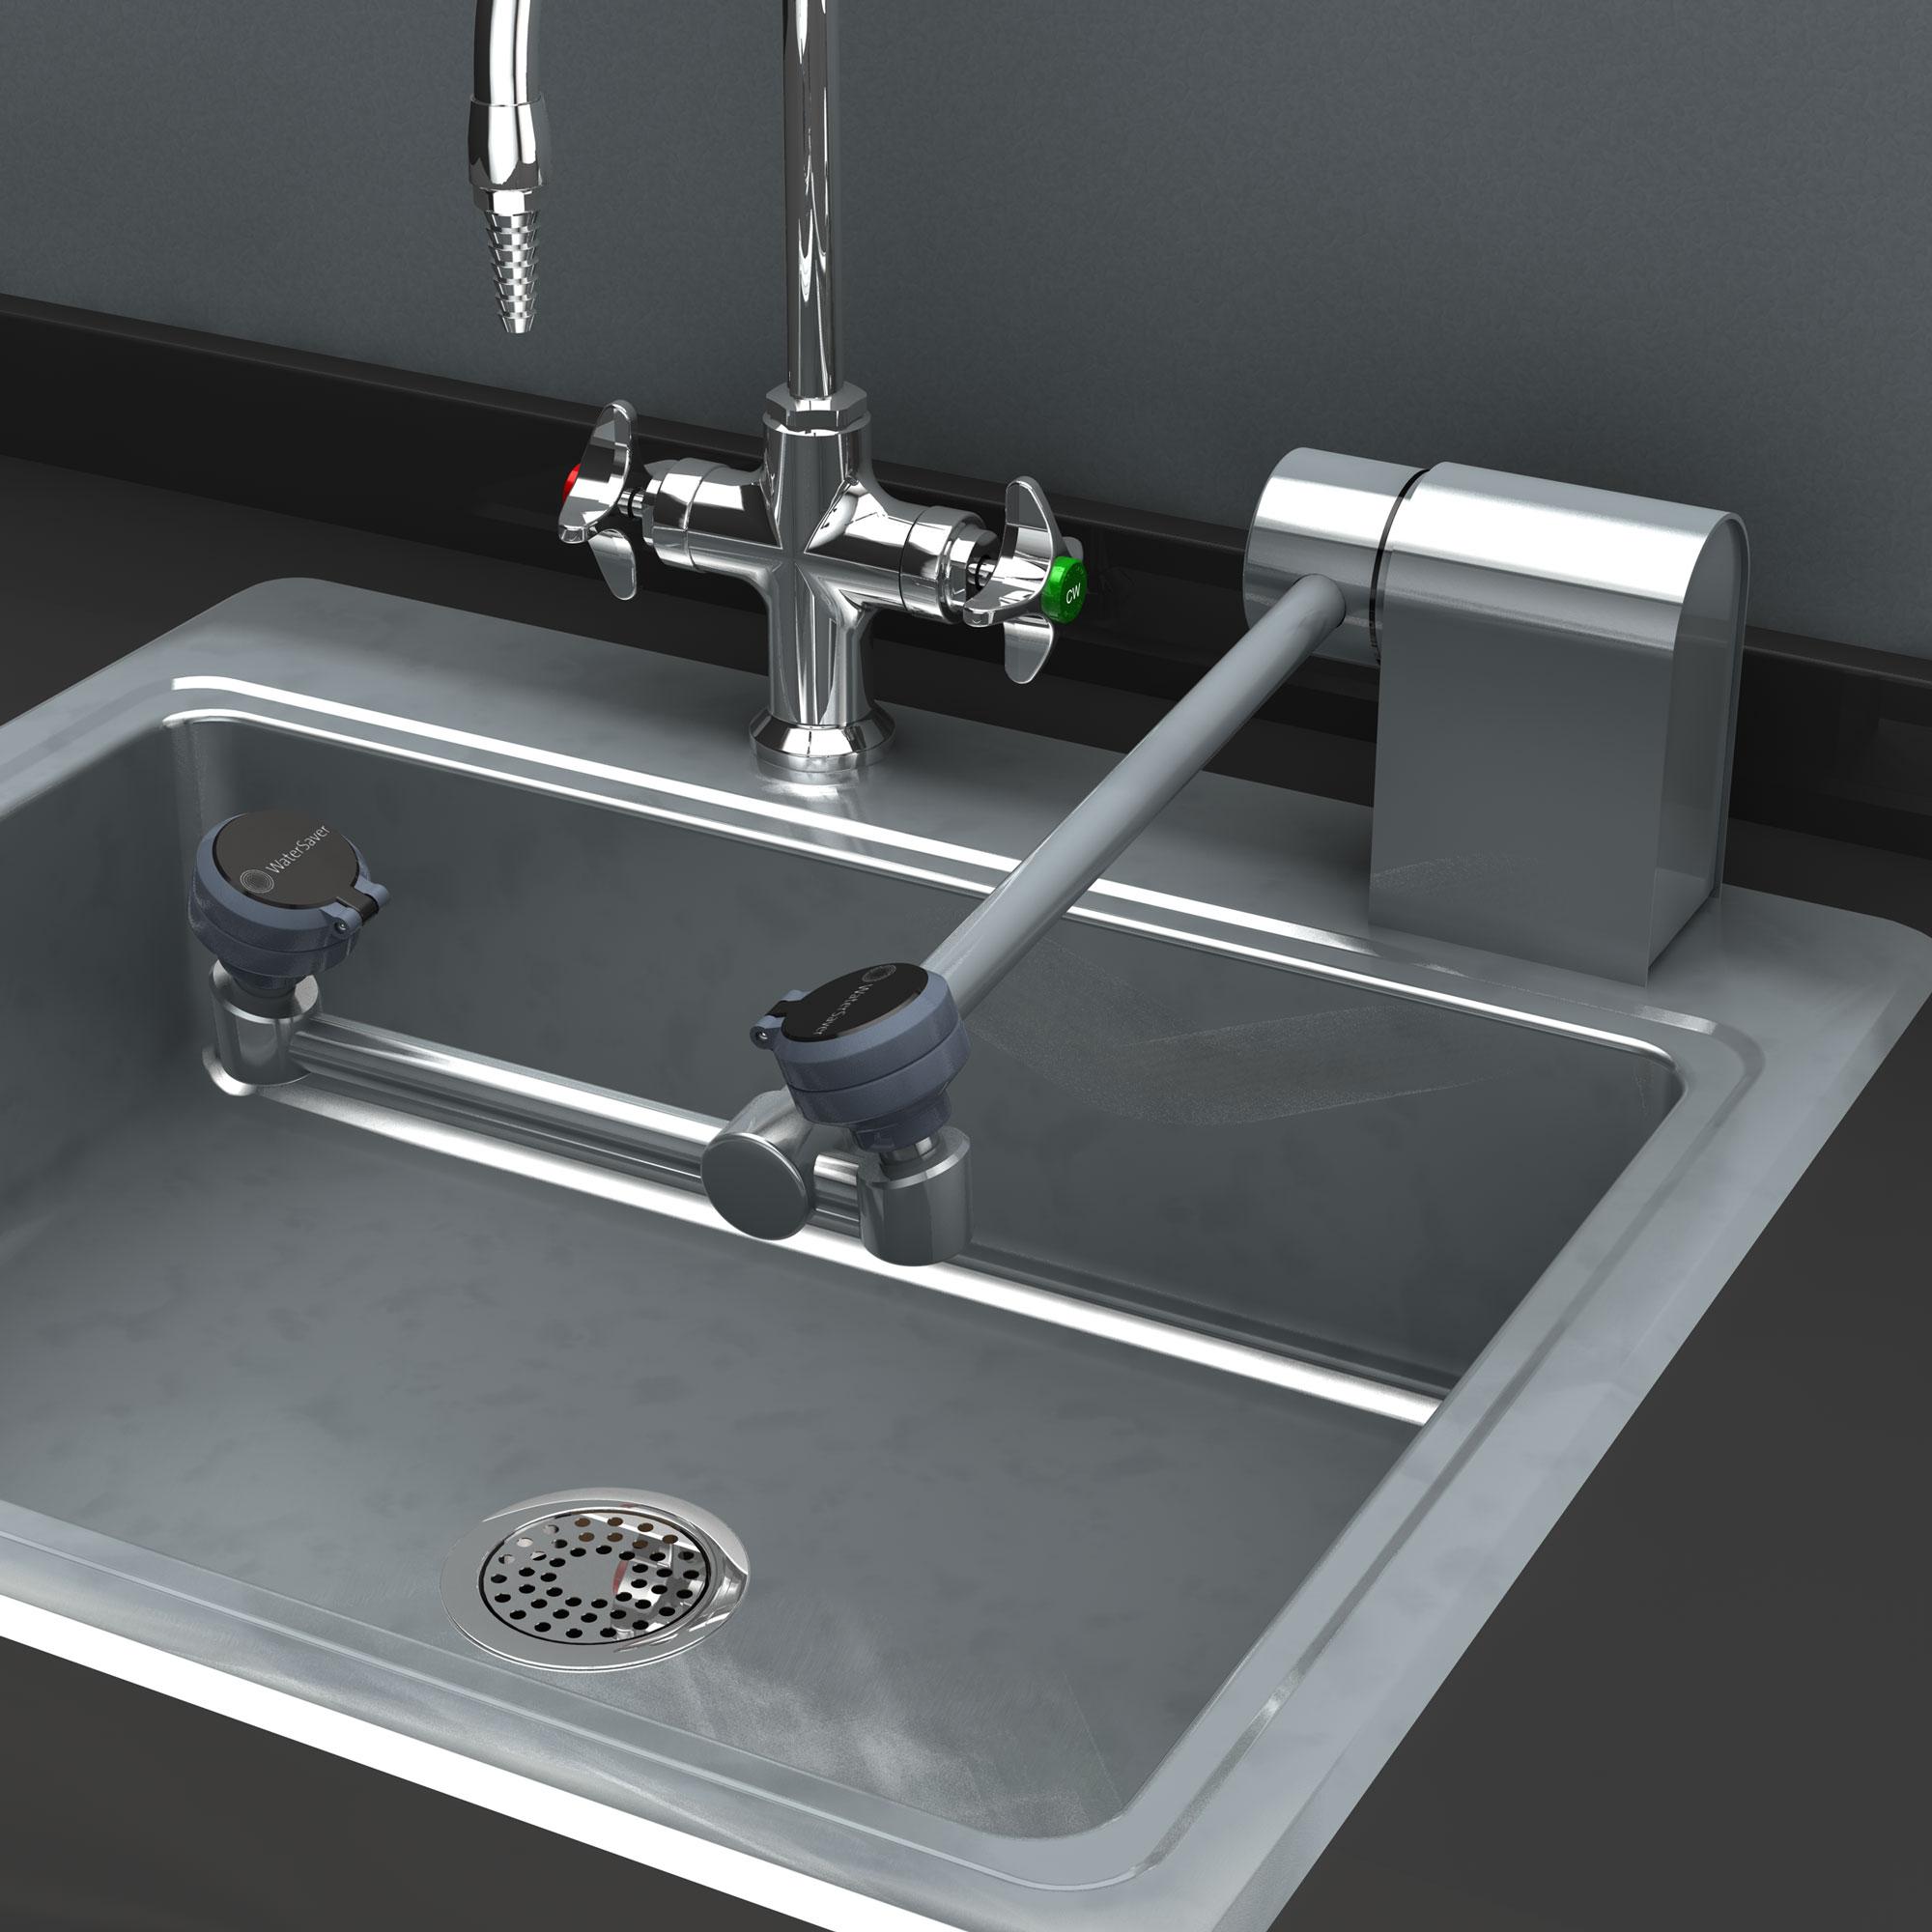 Ew899 Watersaver Faucet Co